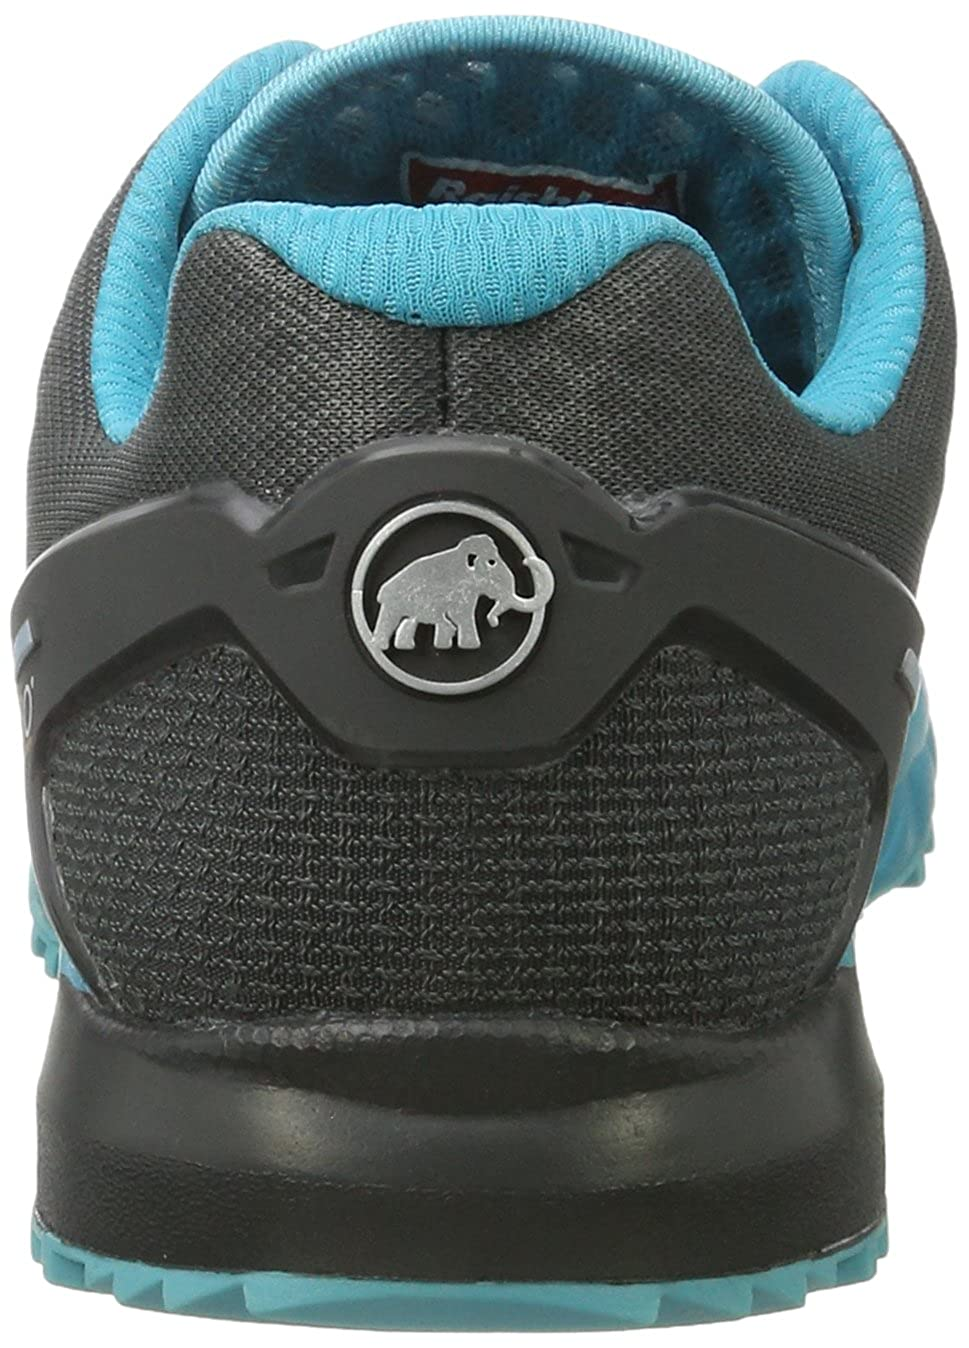 Mammut Damen Damen Damen Mtr 201-ii Low Traillaufschuhe ddac01